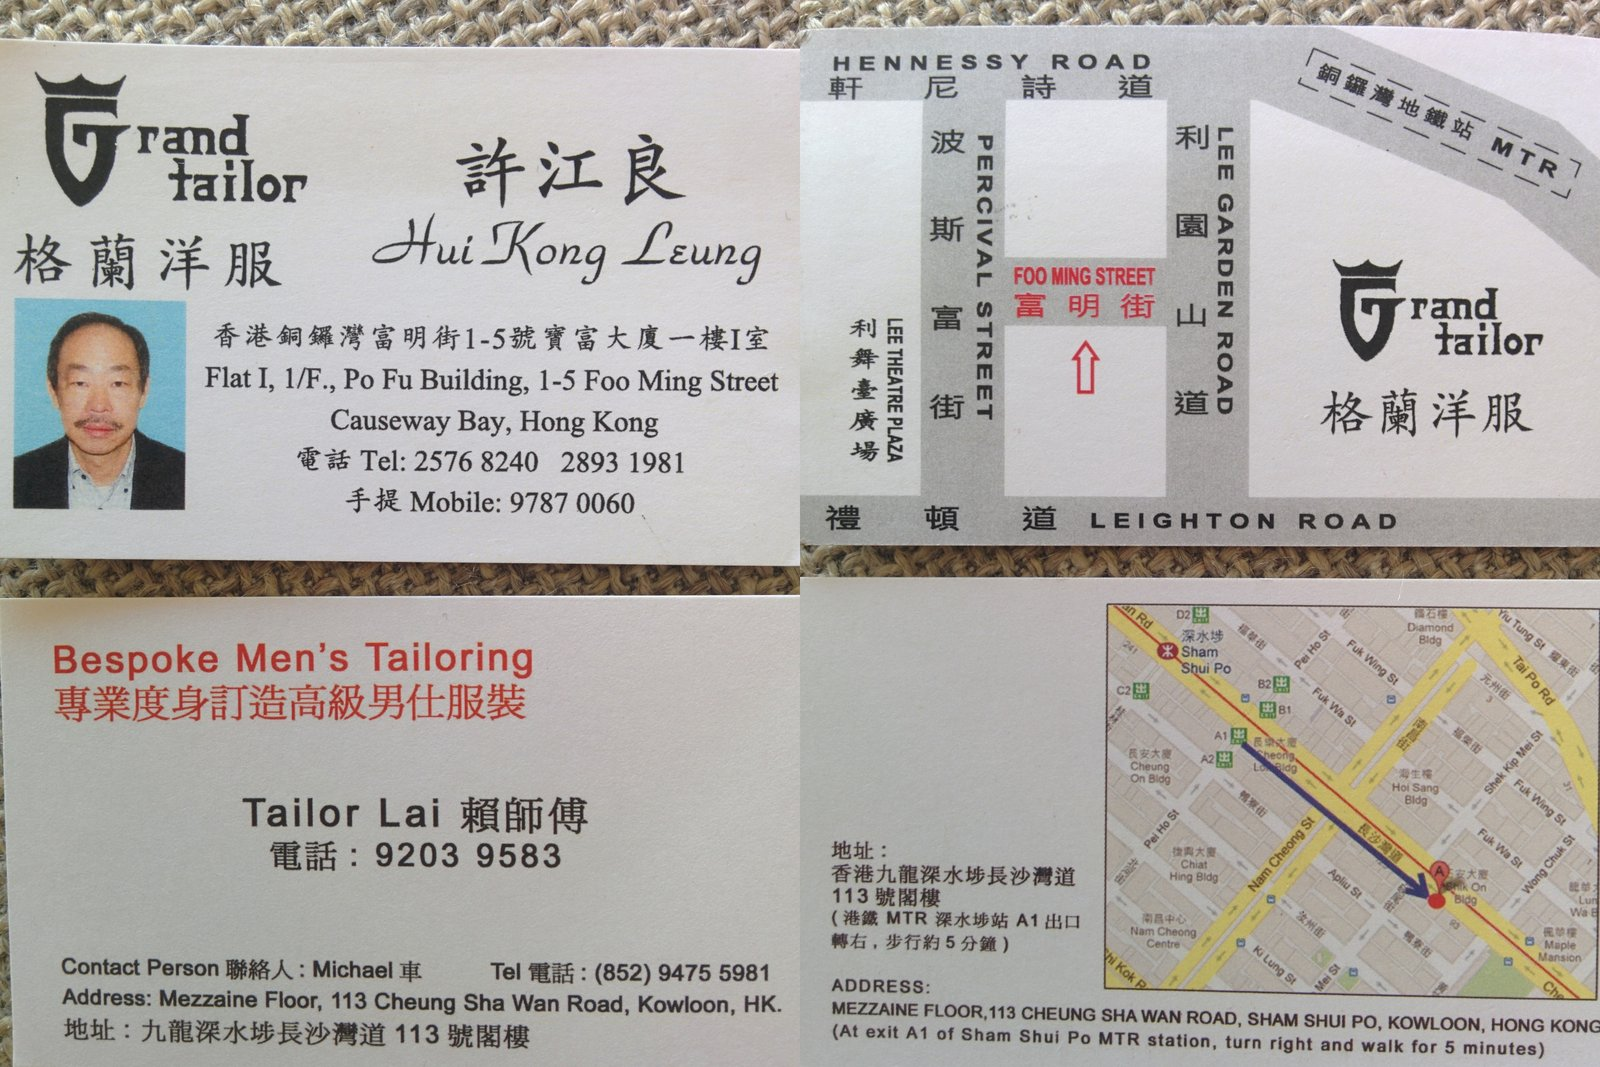 Old Fashioned Michael Yao Fu Photo - Resume Ideas - bayaar.info